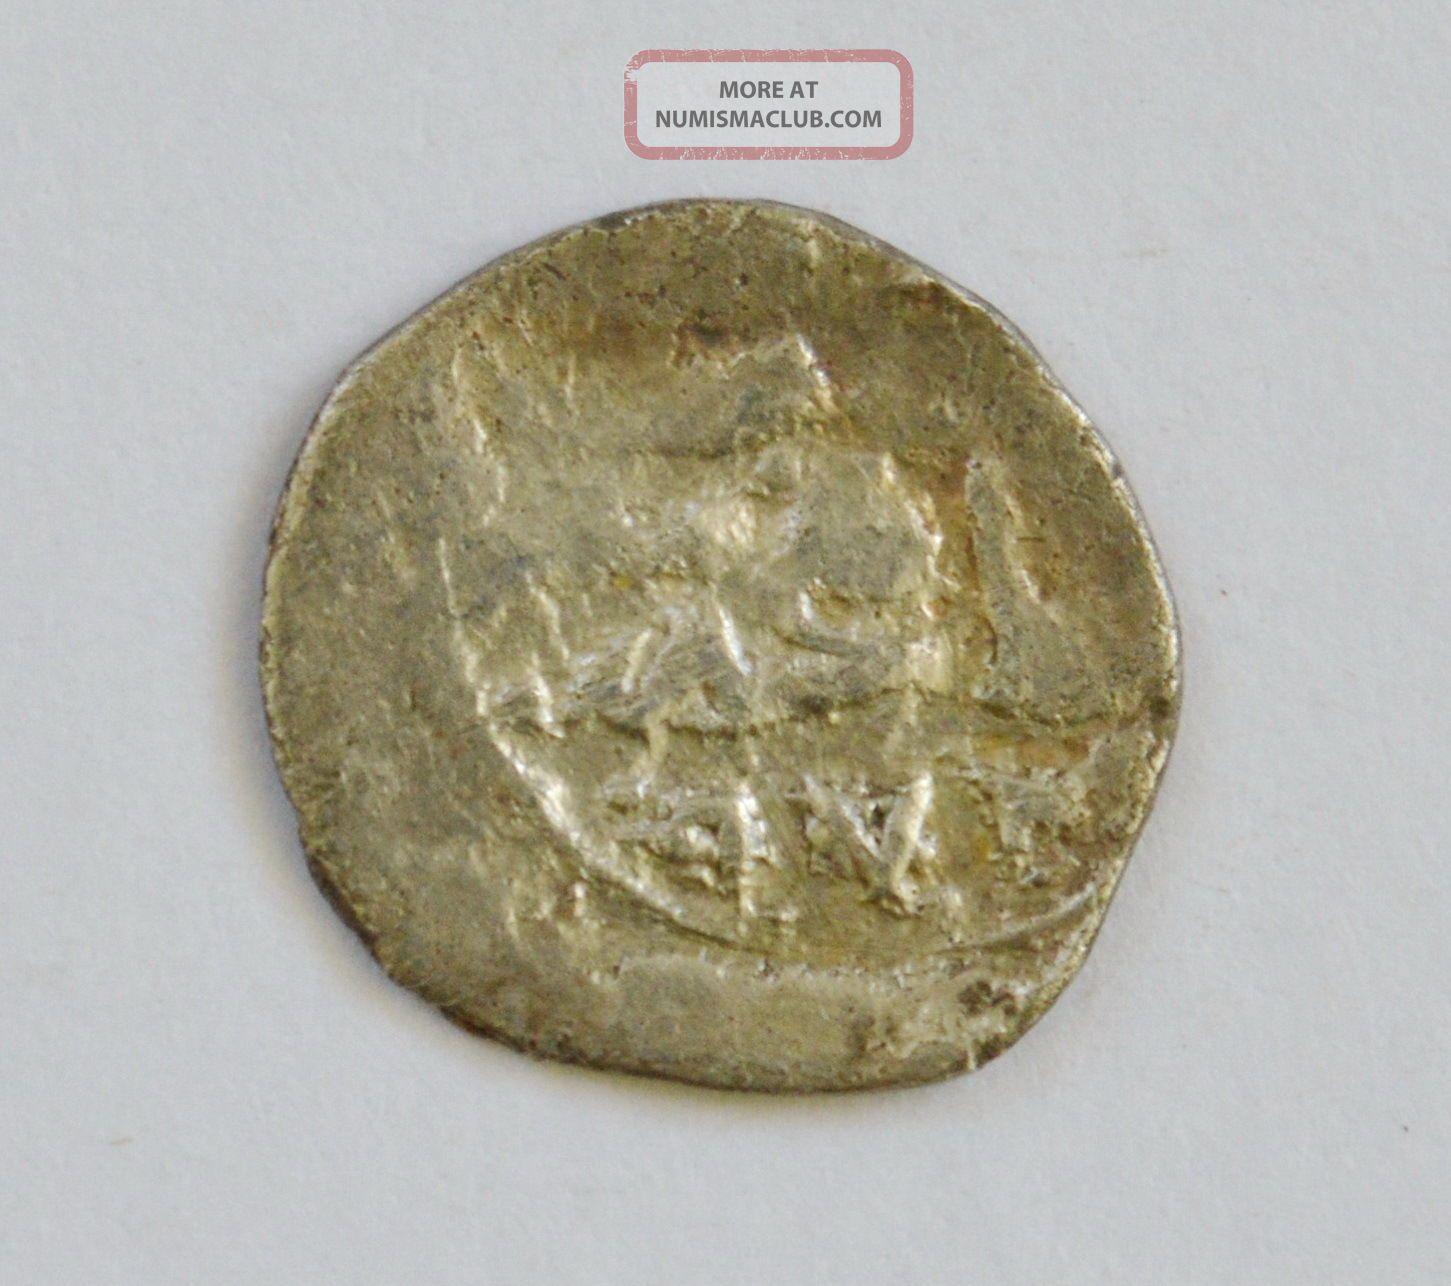 Ottoman Empire 974 Ah Akche Selim Ii Rare Islamic Silver Coin Canca Coins: Medieval photo